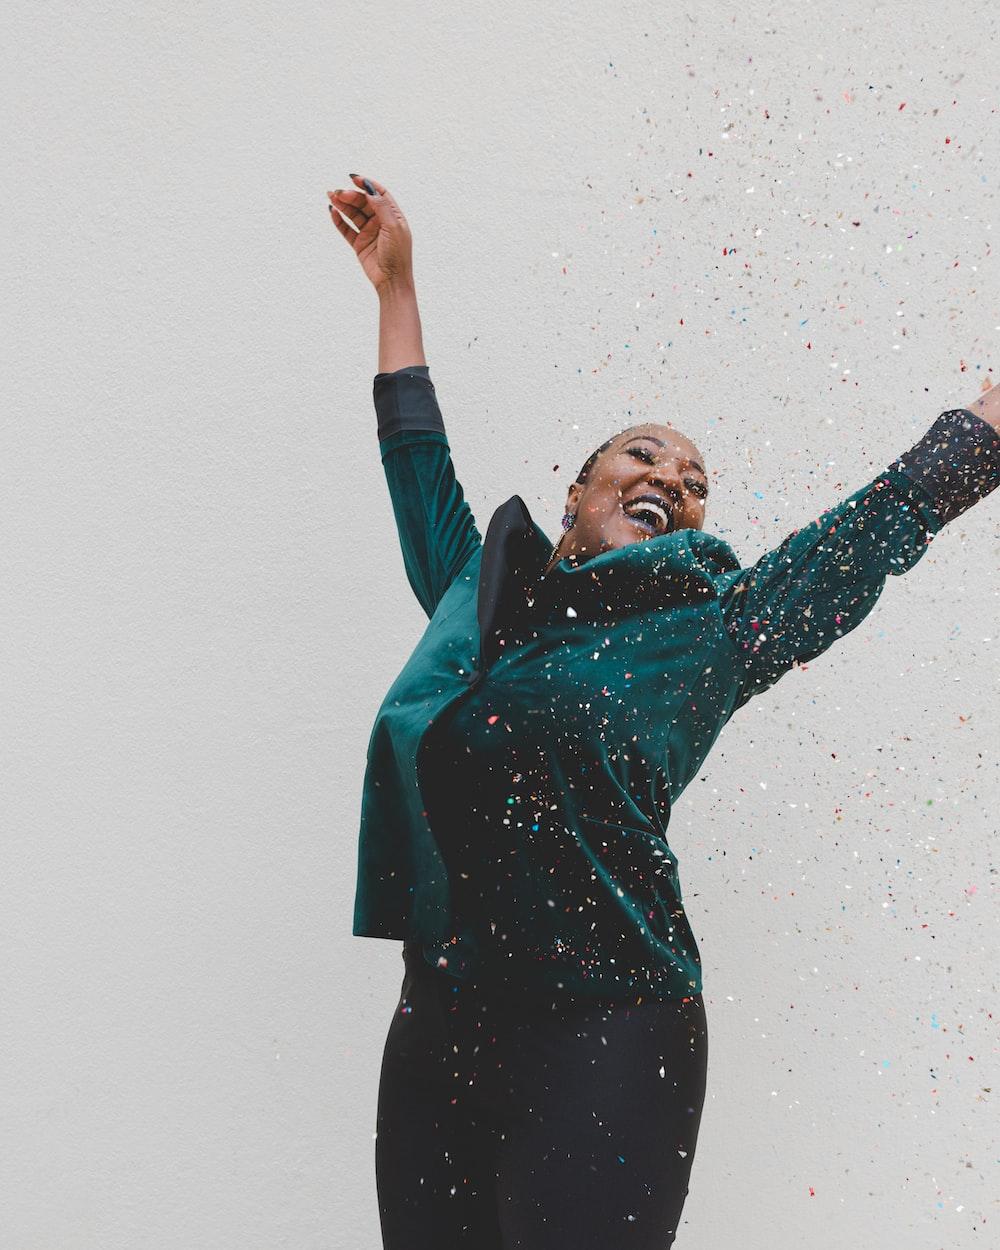 woman in green jacket raising her hands